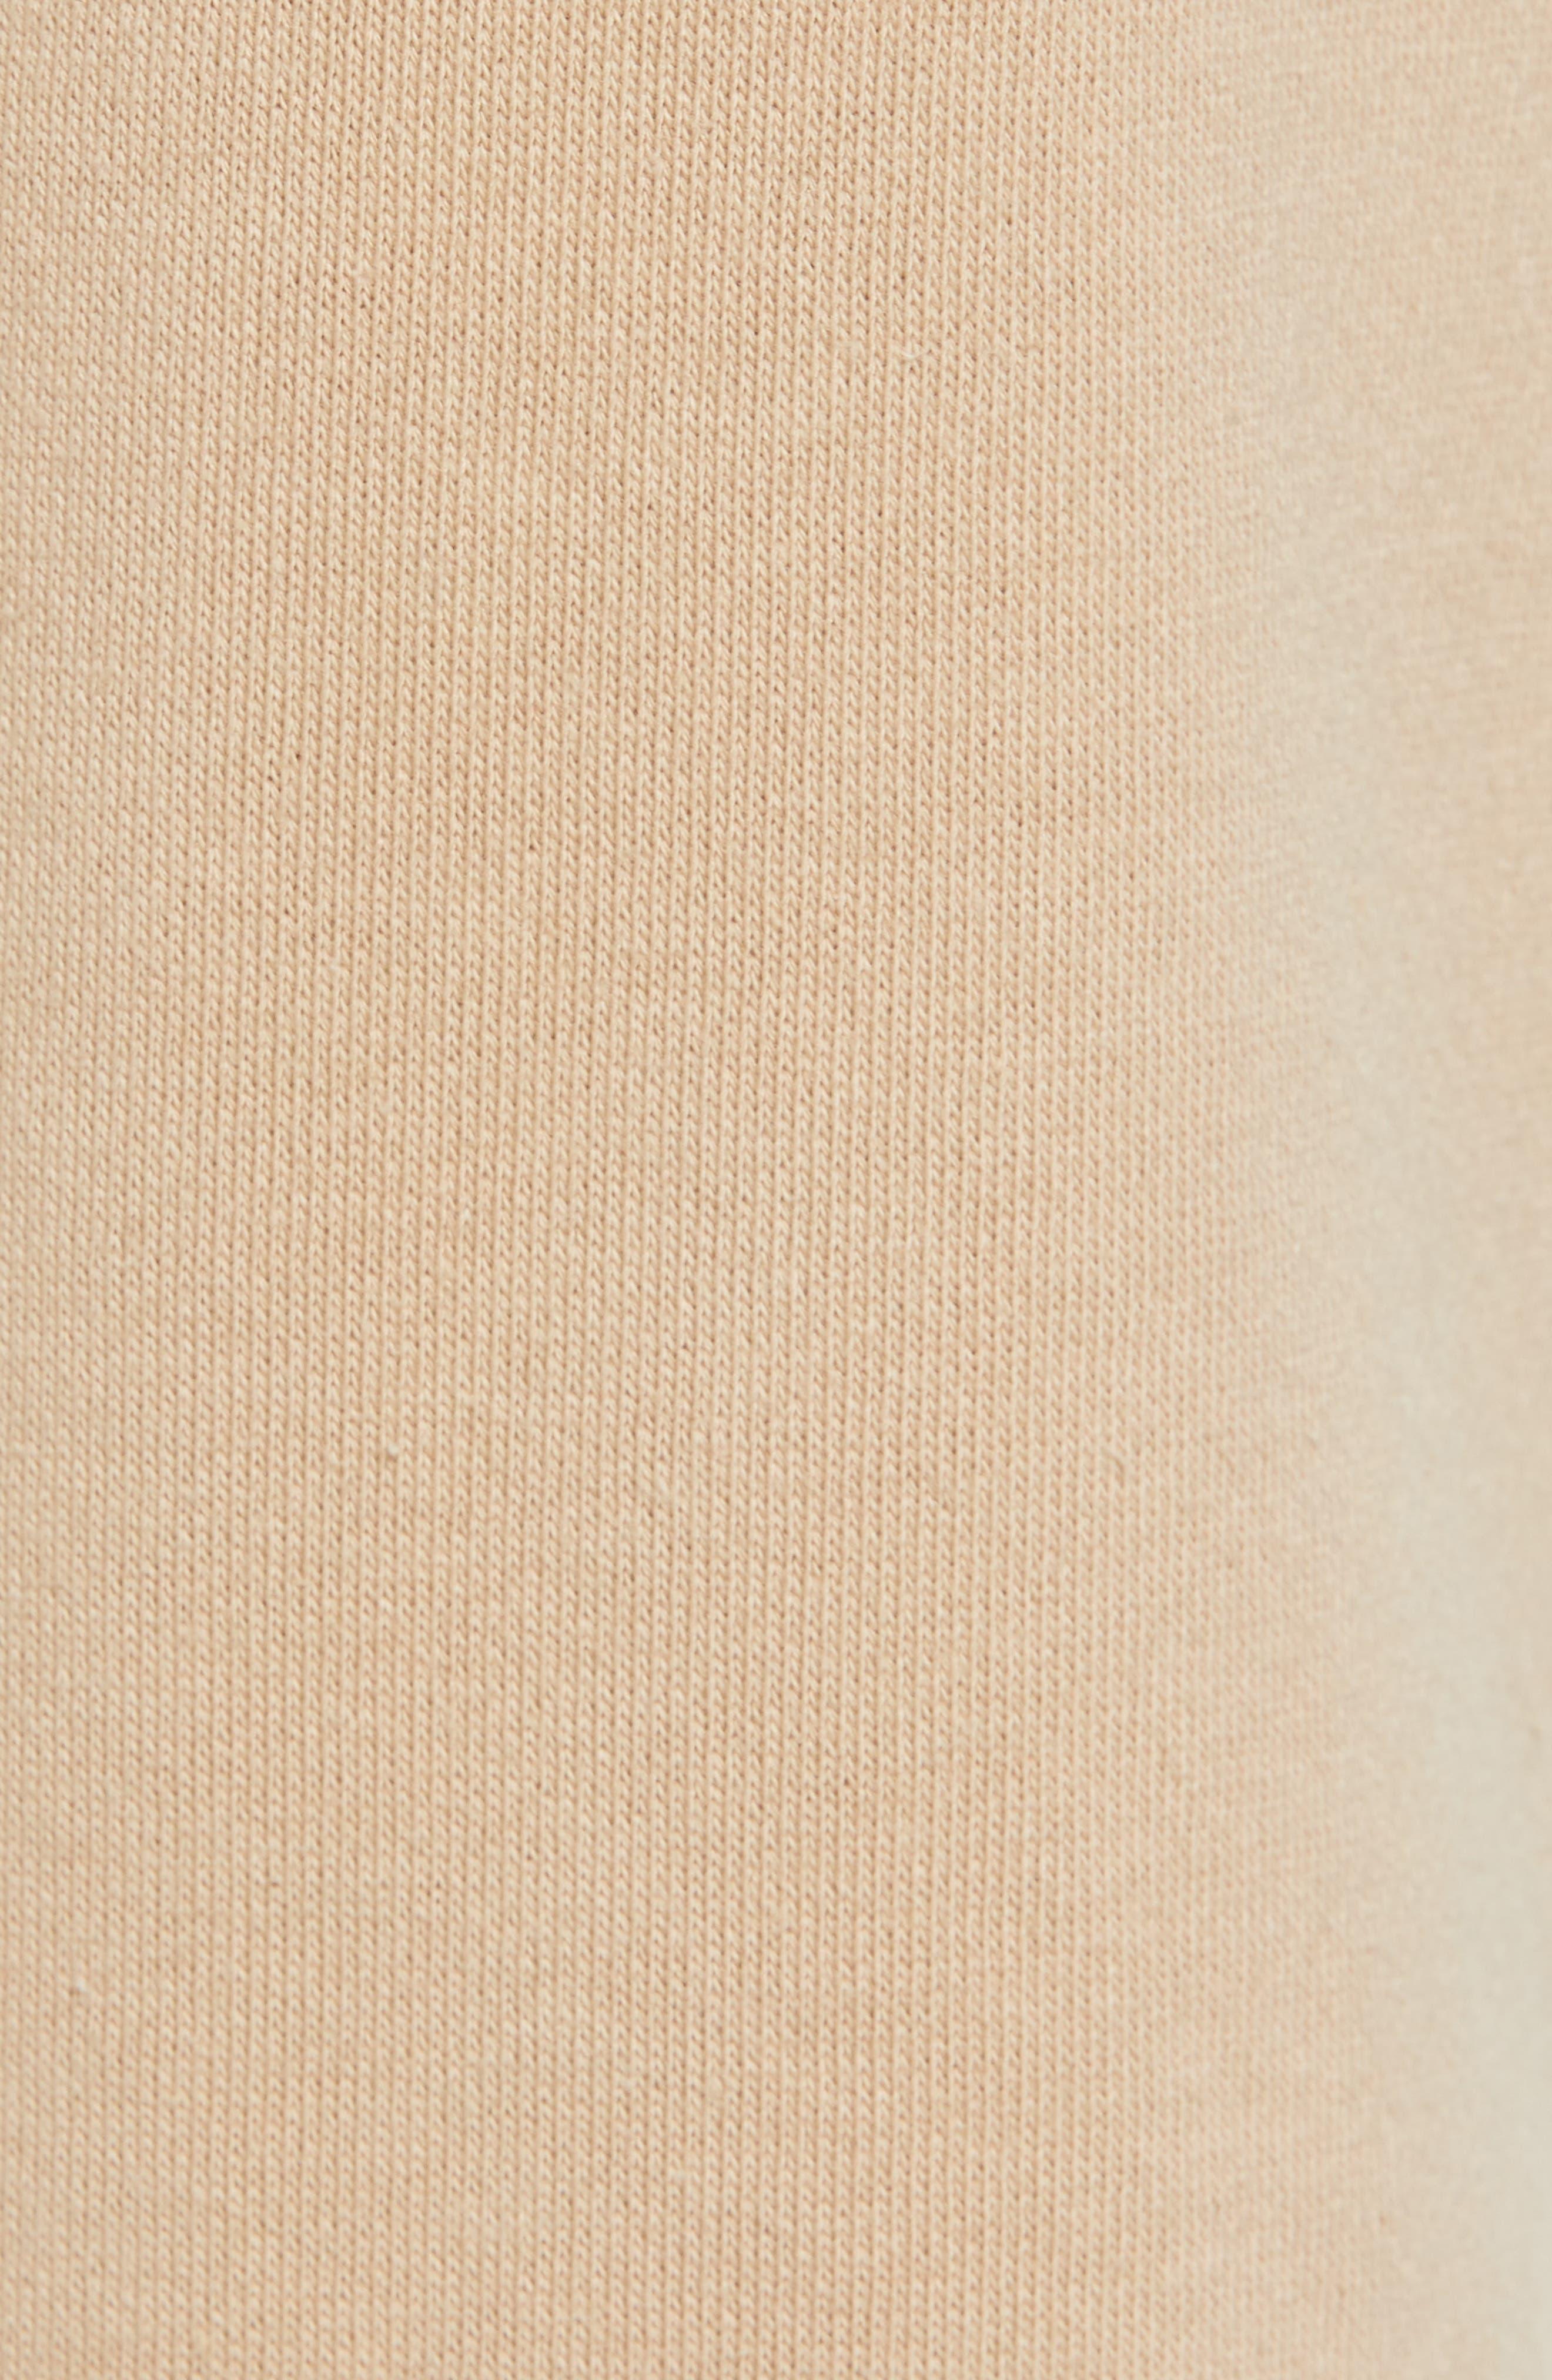 Terry Drawstring Shorts,                             Alternate thumbnail 5, color,                             235